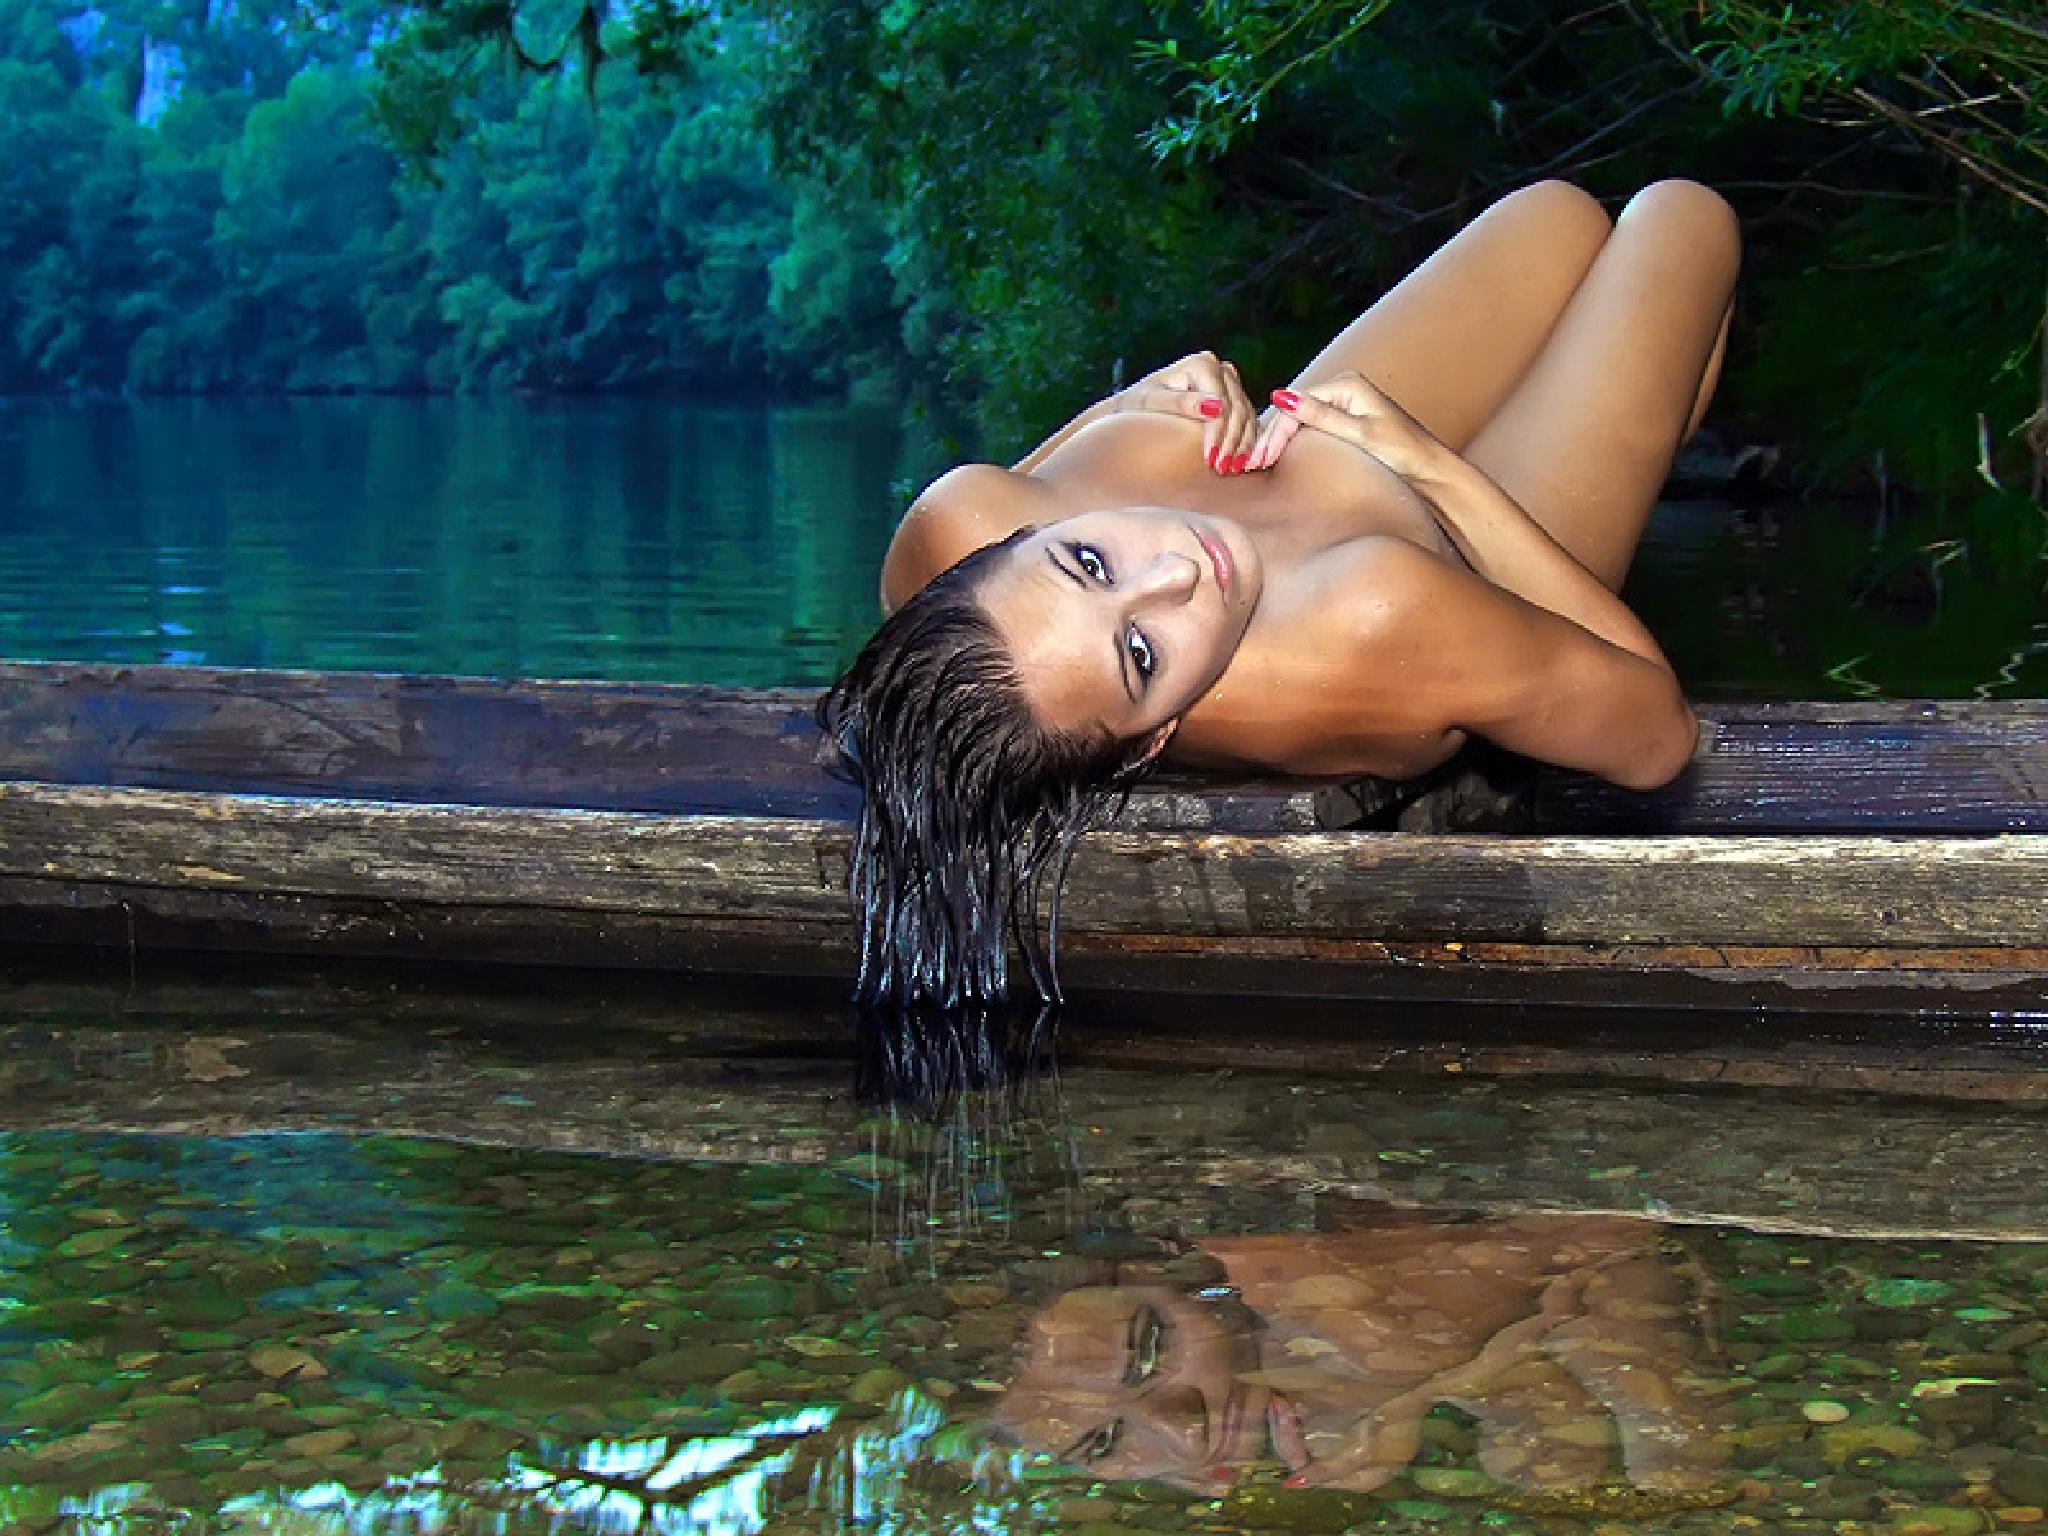 river girl by gordan.kos